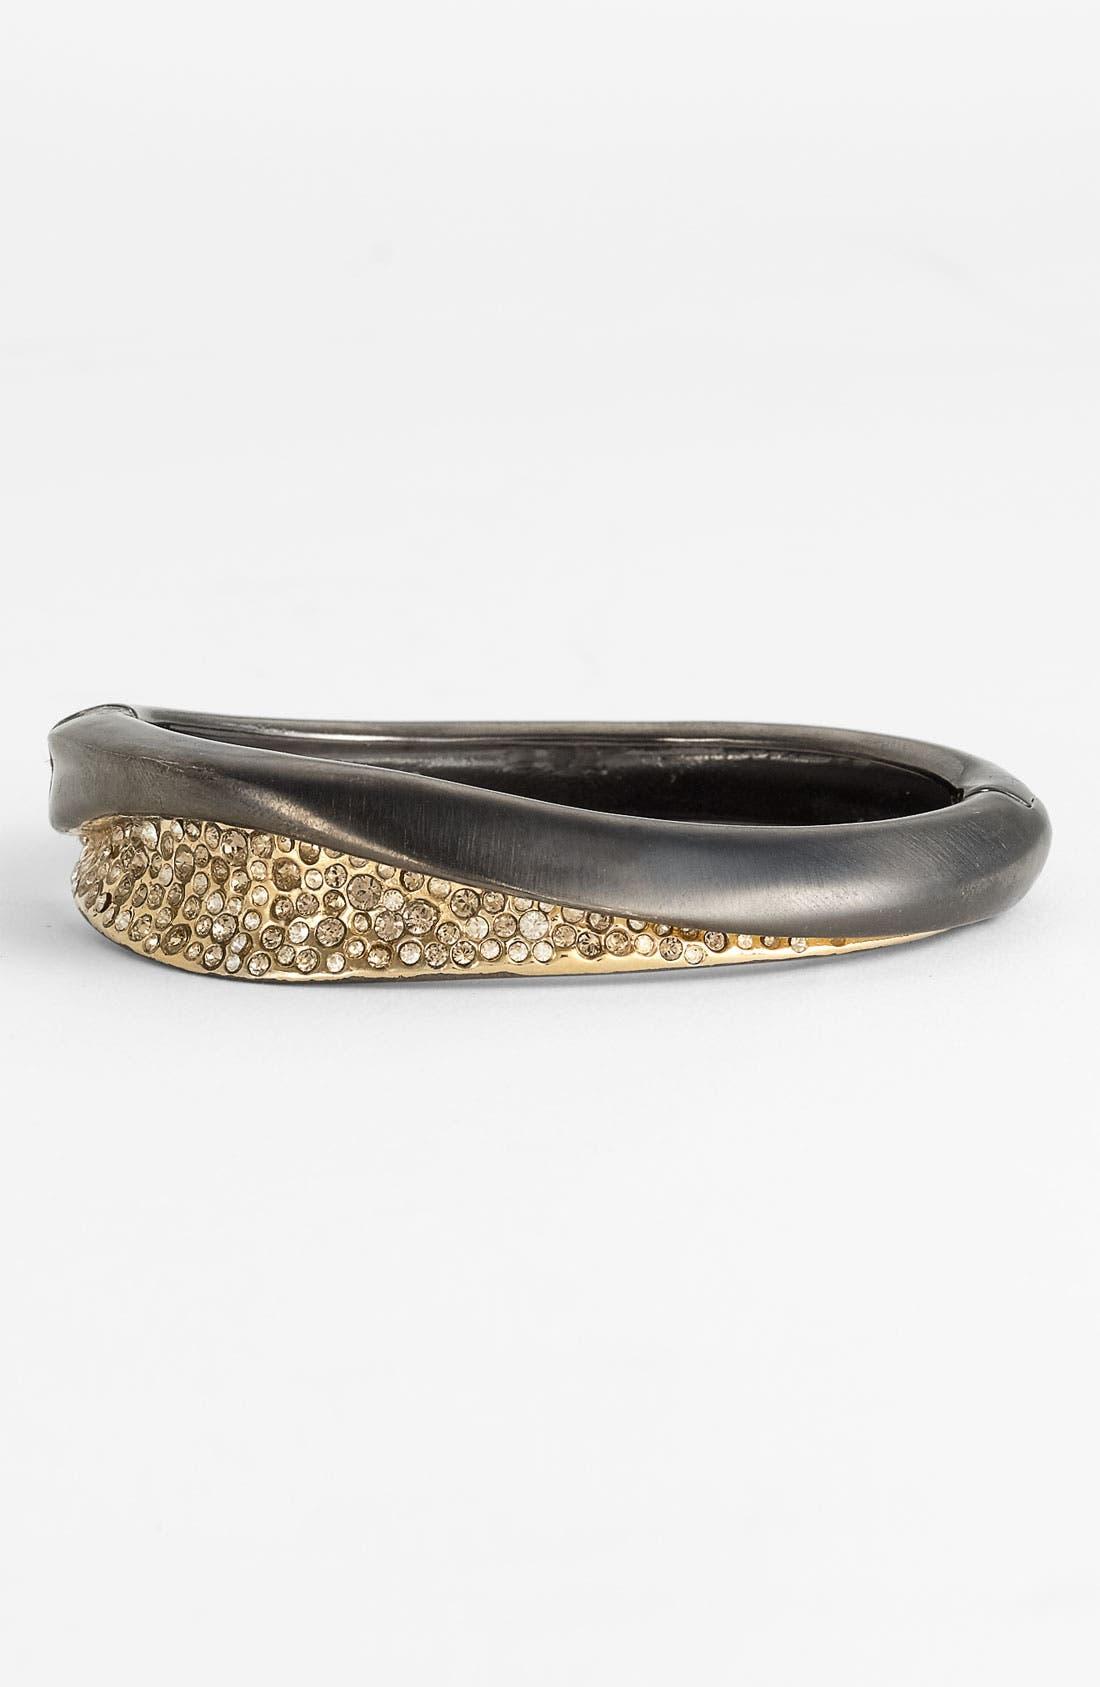 Alternate Image 1 Selected - Alexis Bittar 'Miss Havisham' Crystal Encrusted Hinged Bracelet